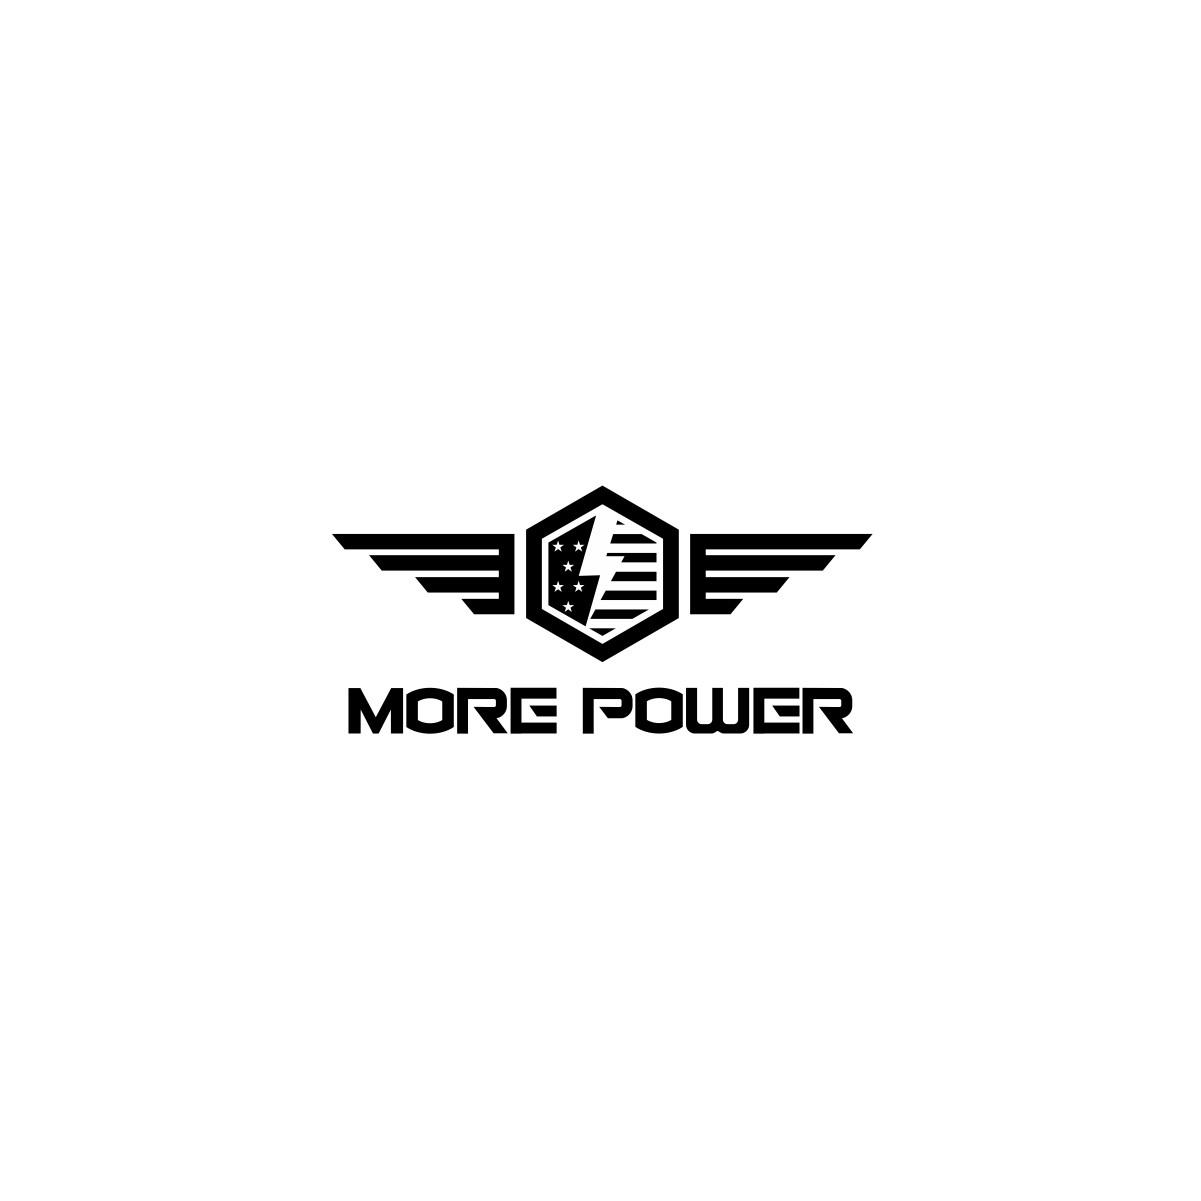 Powerful Logo Design